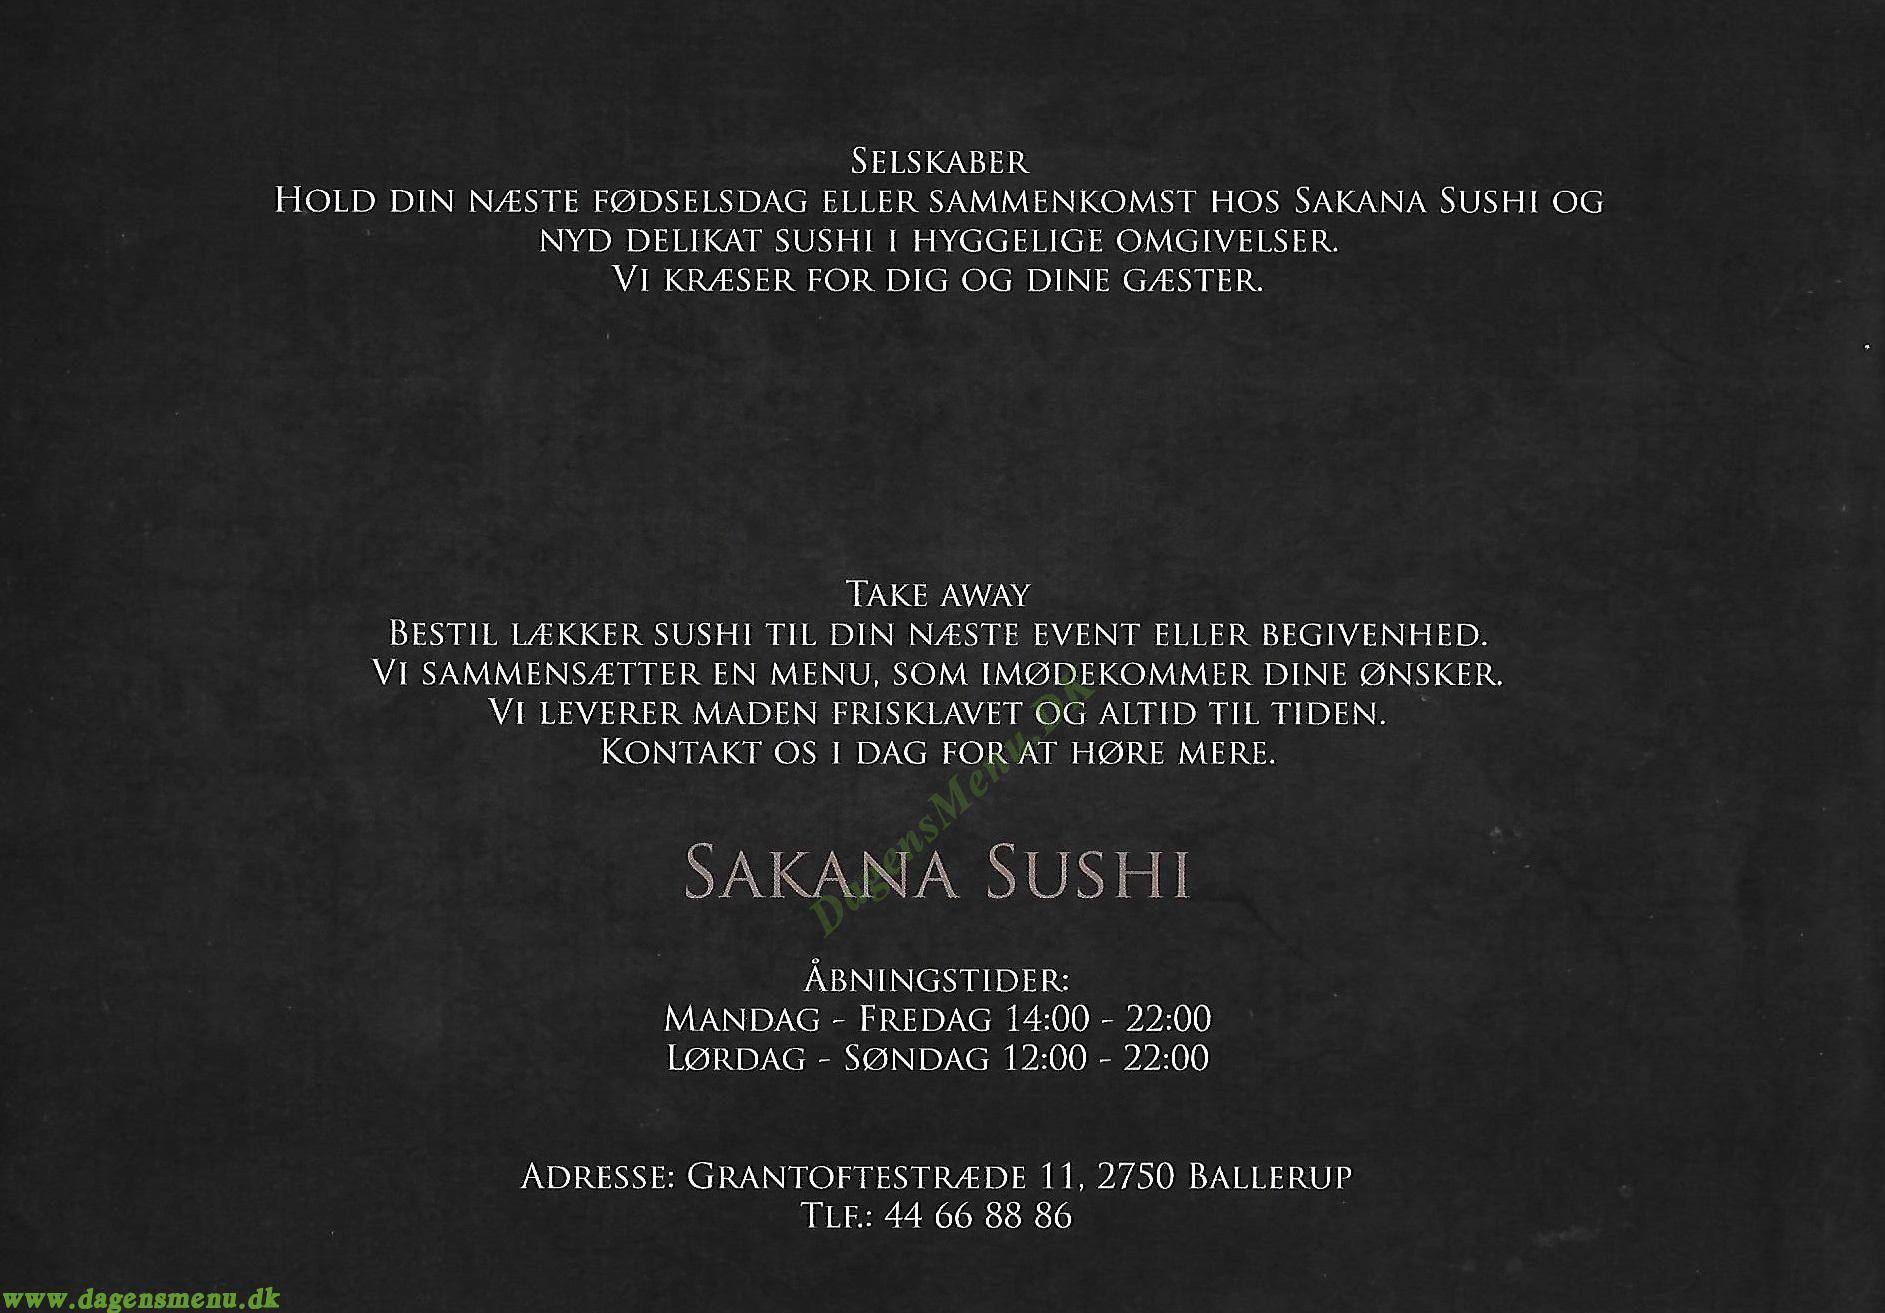 Sakana Sushi - Menukort